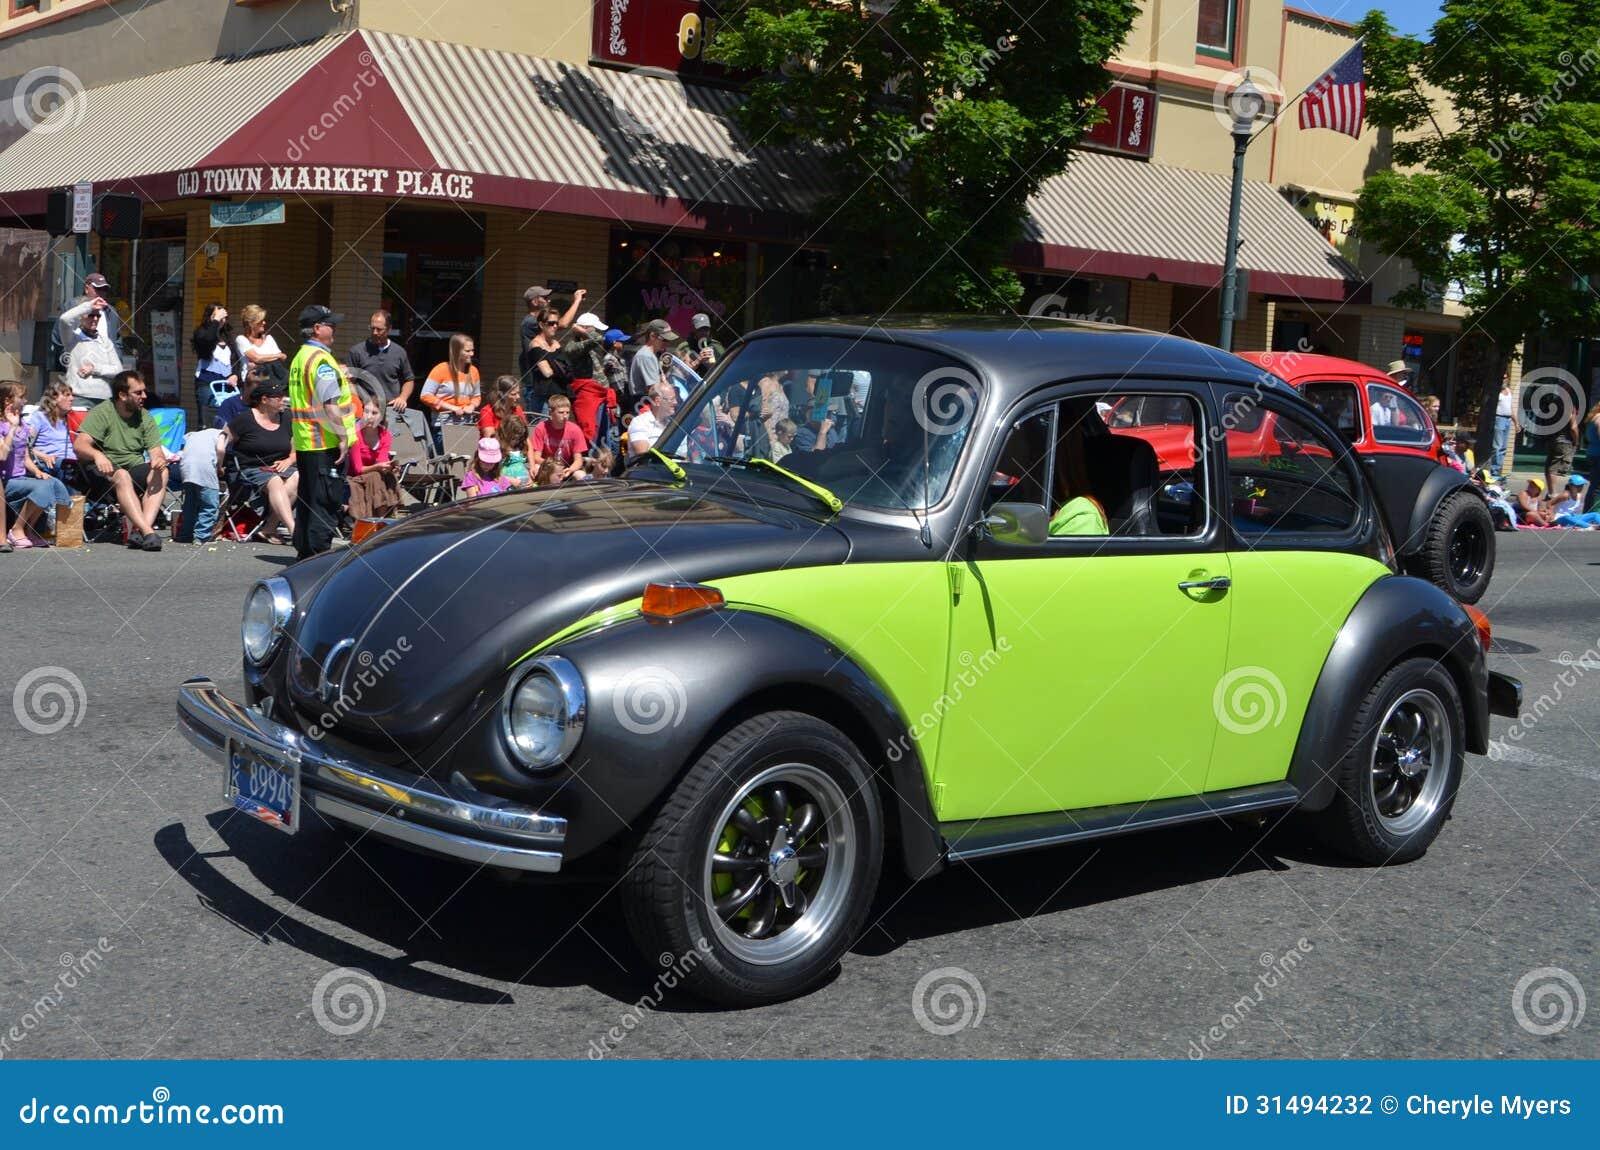 my beetle a volkswagen restoration vw side front bugs blog standard classiccult after